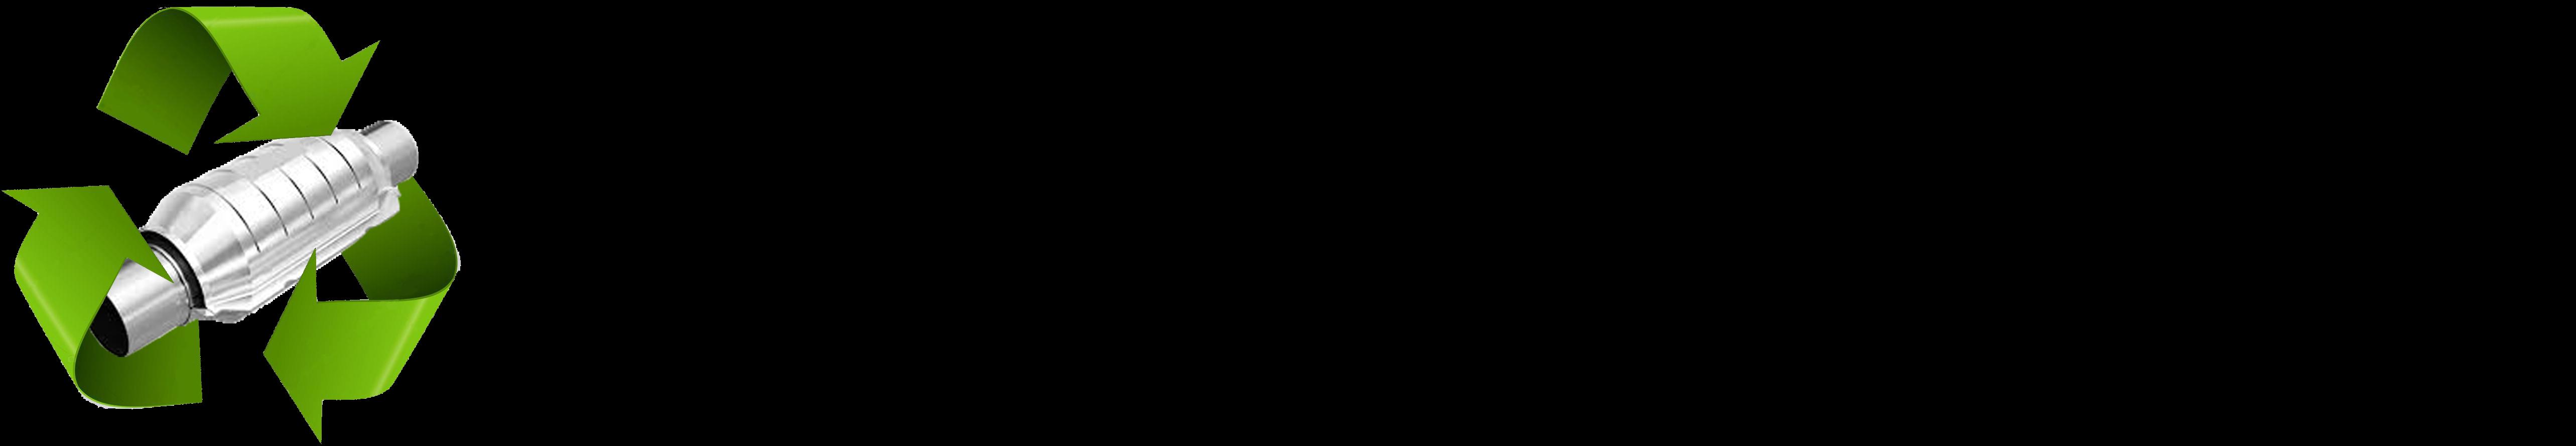 KATALIZATORS.RU